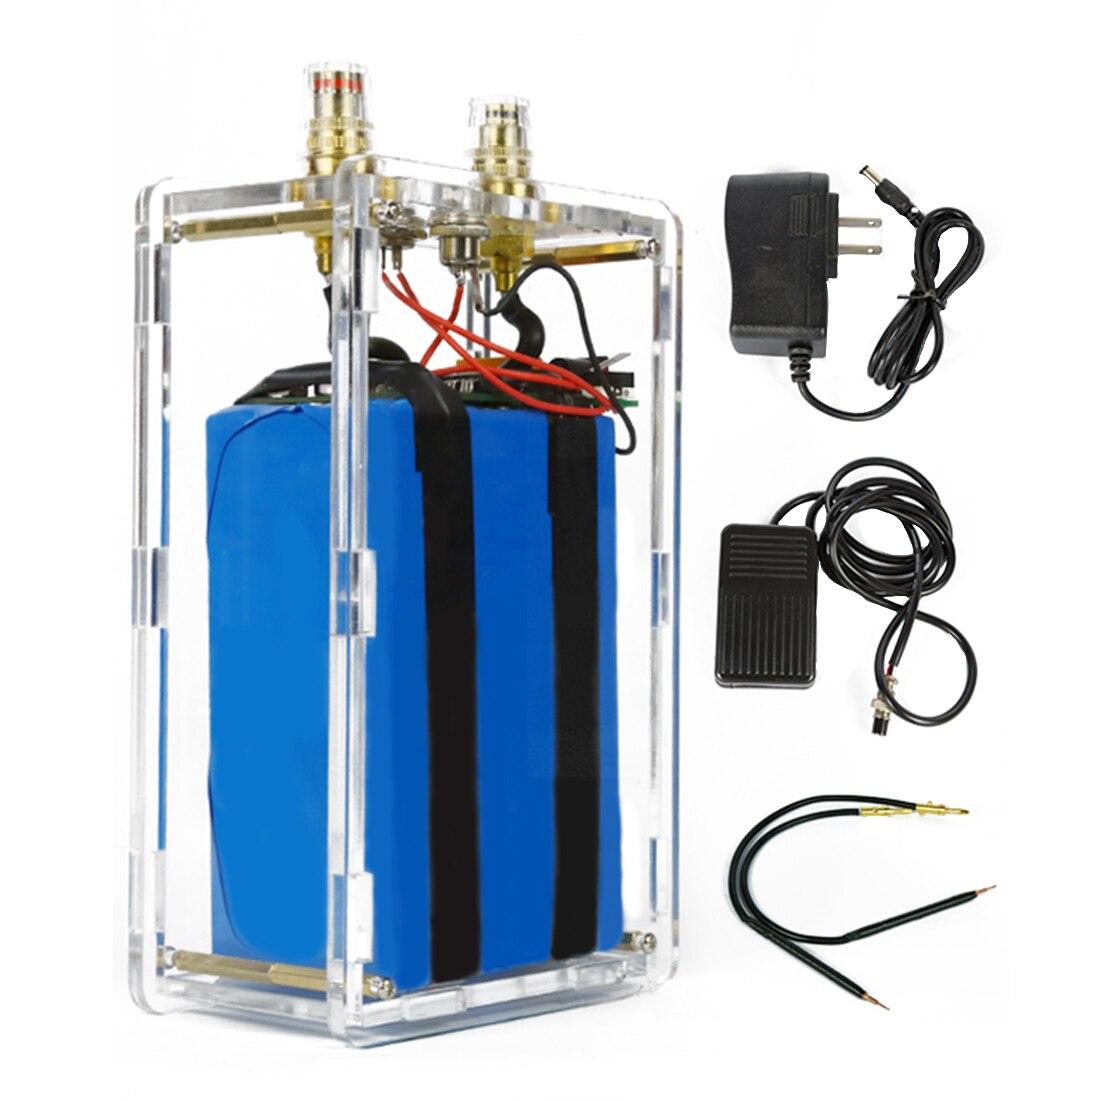 DIY Portable Spot Welder Lithium Battery Powered Spot Welder With Acrylic Shell